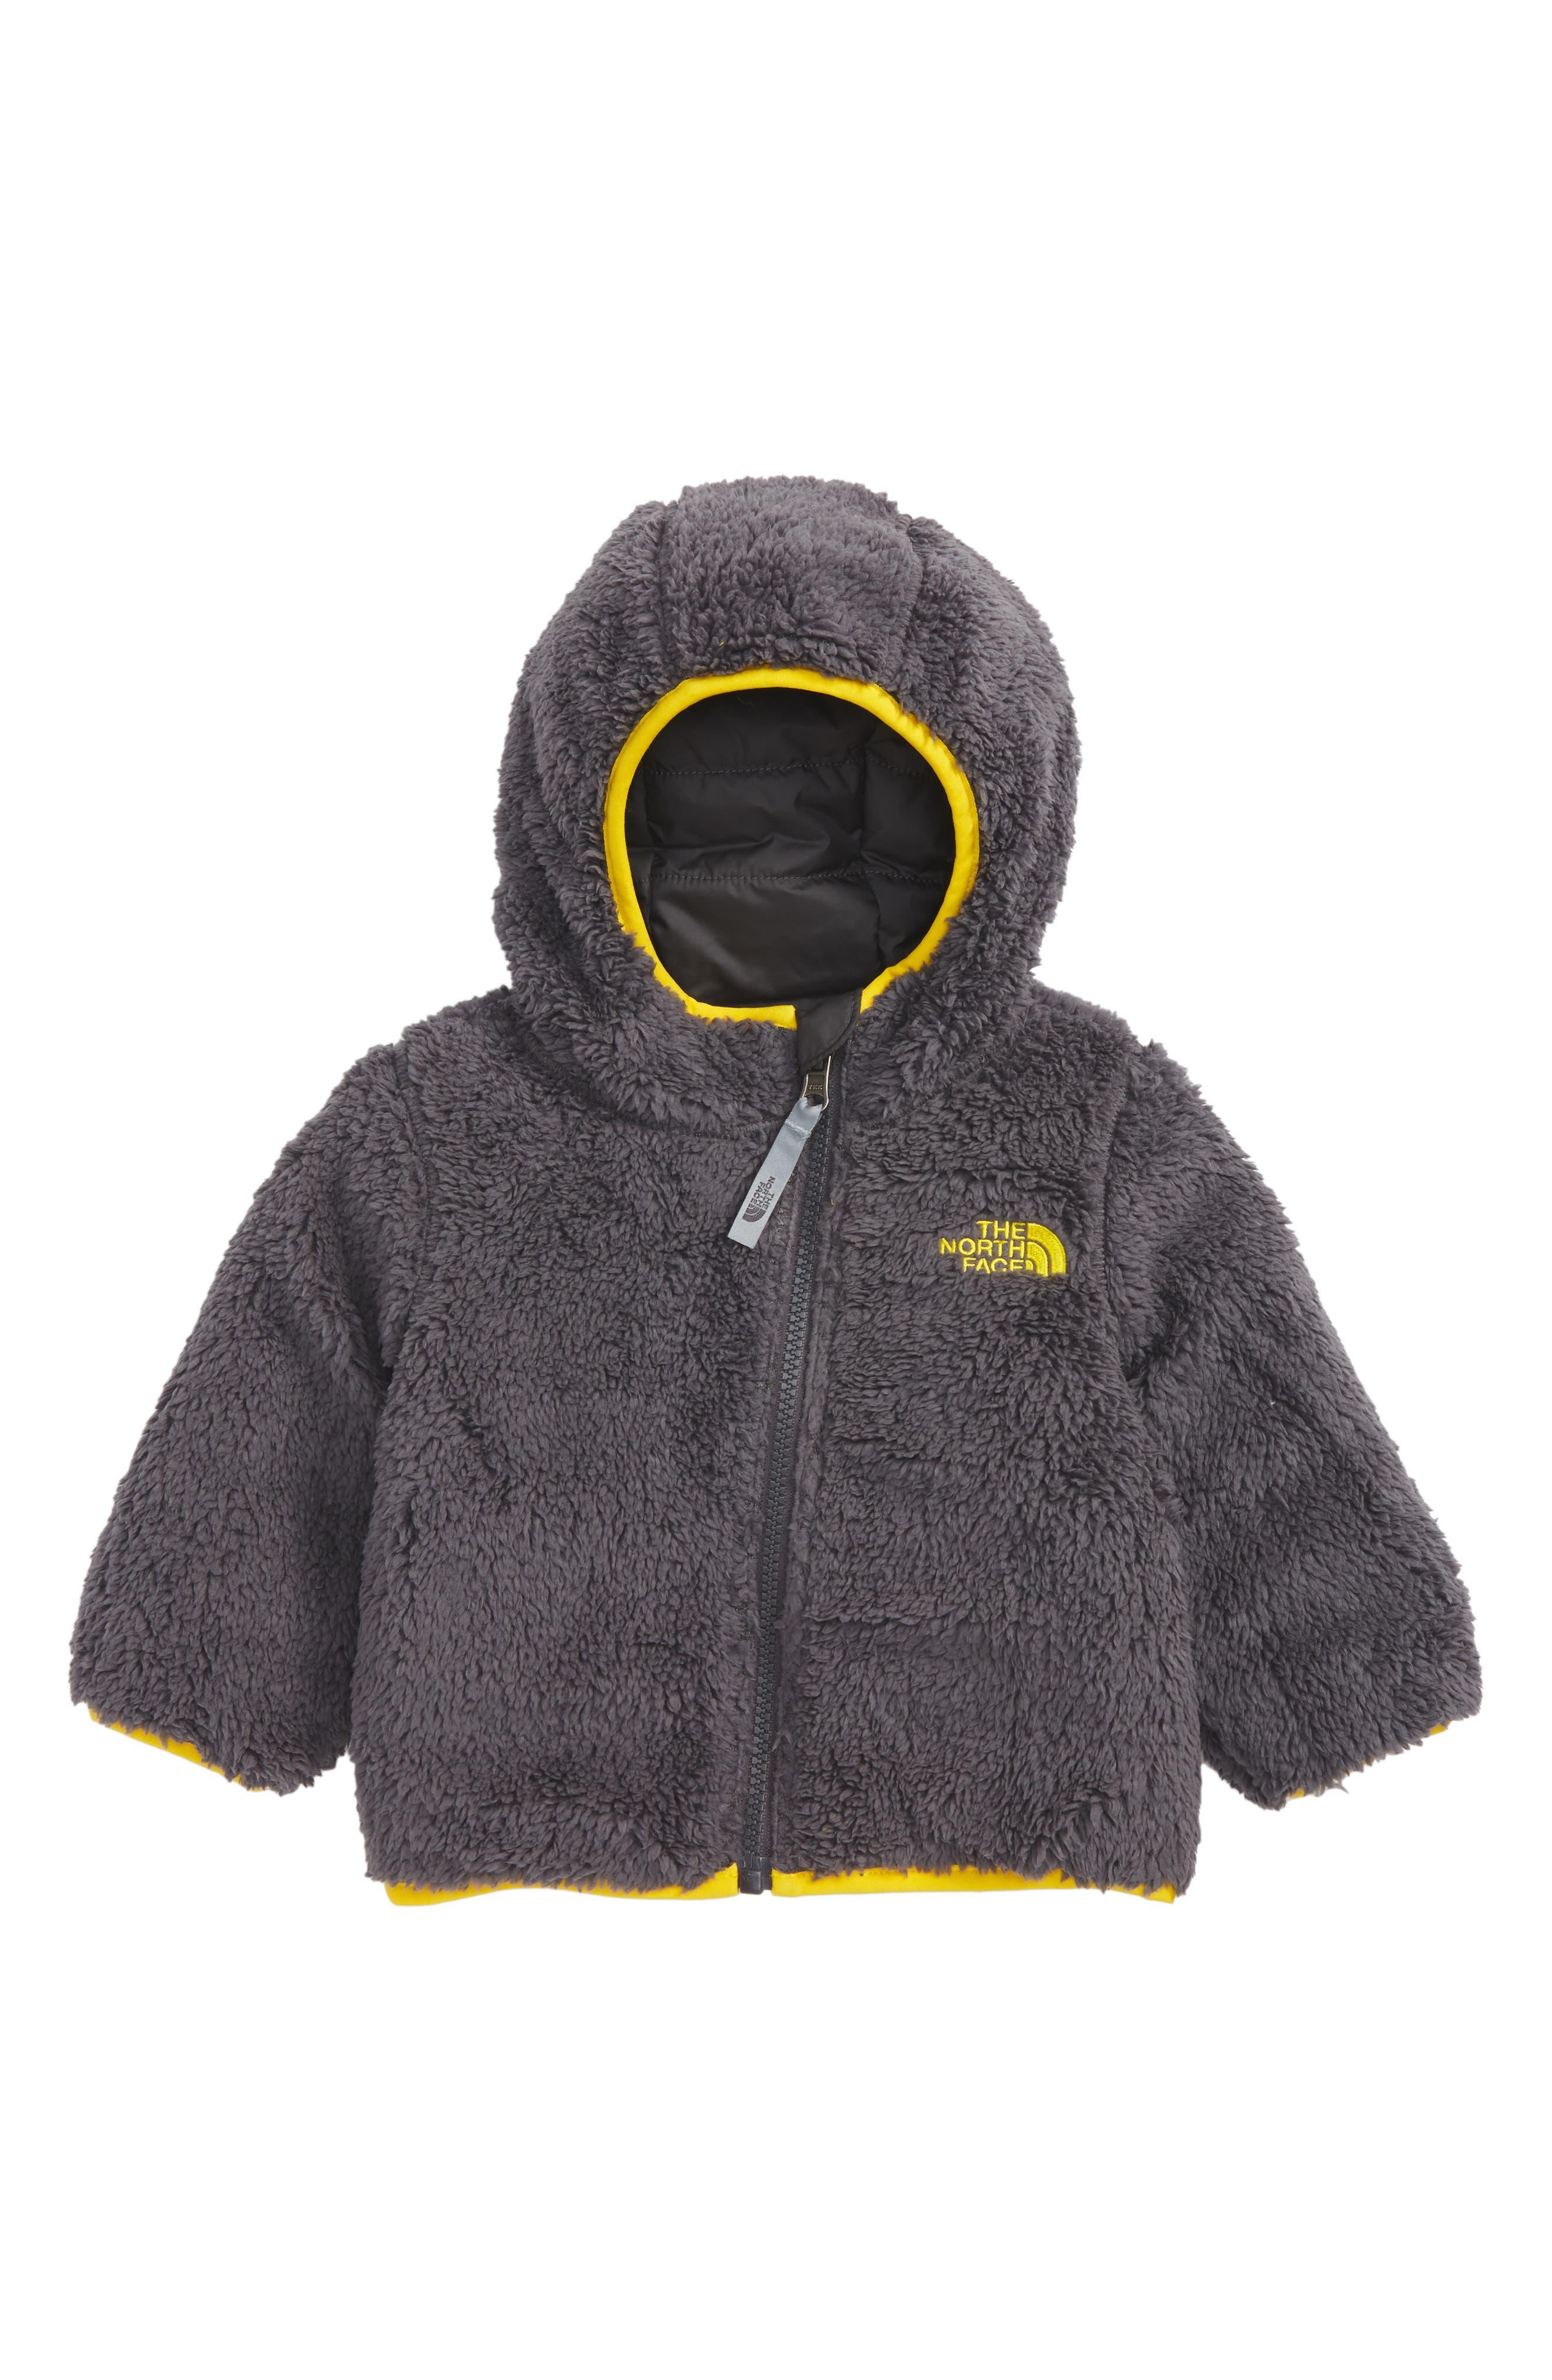 Mount Chimborazo Reversible Jacket,                             Alternate thumbnail 2, color,                             Canary Yellow